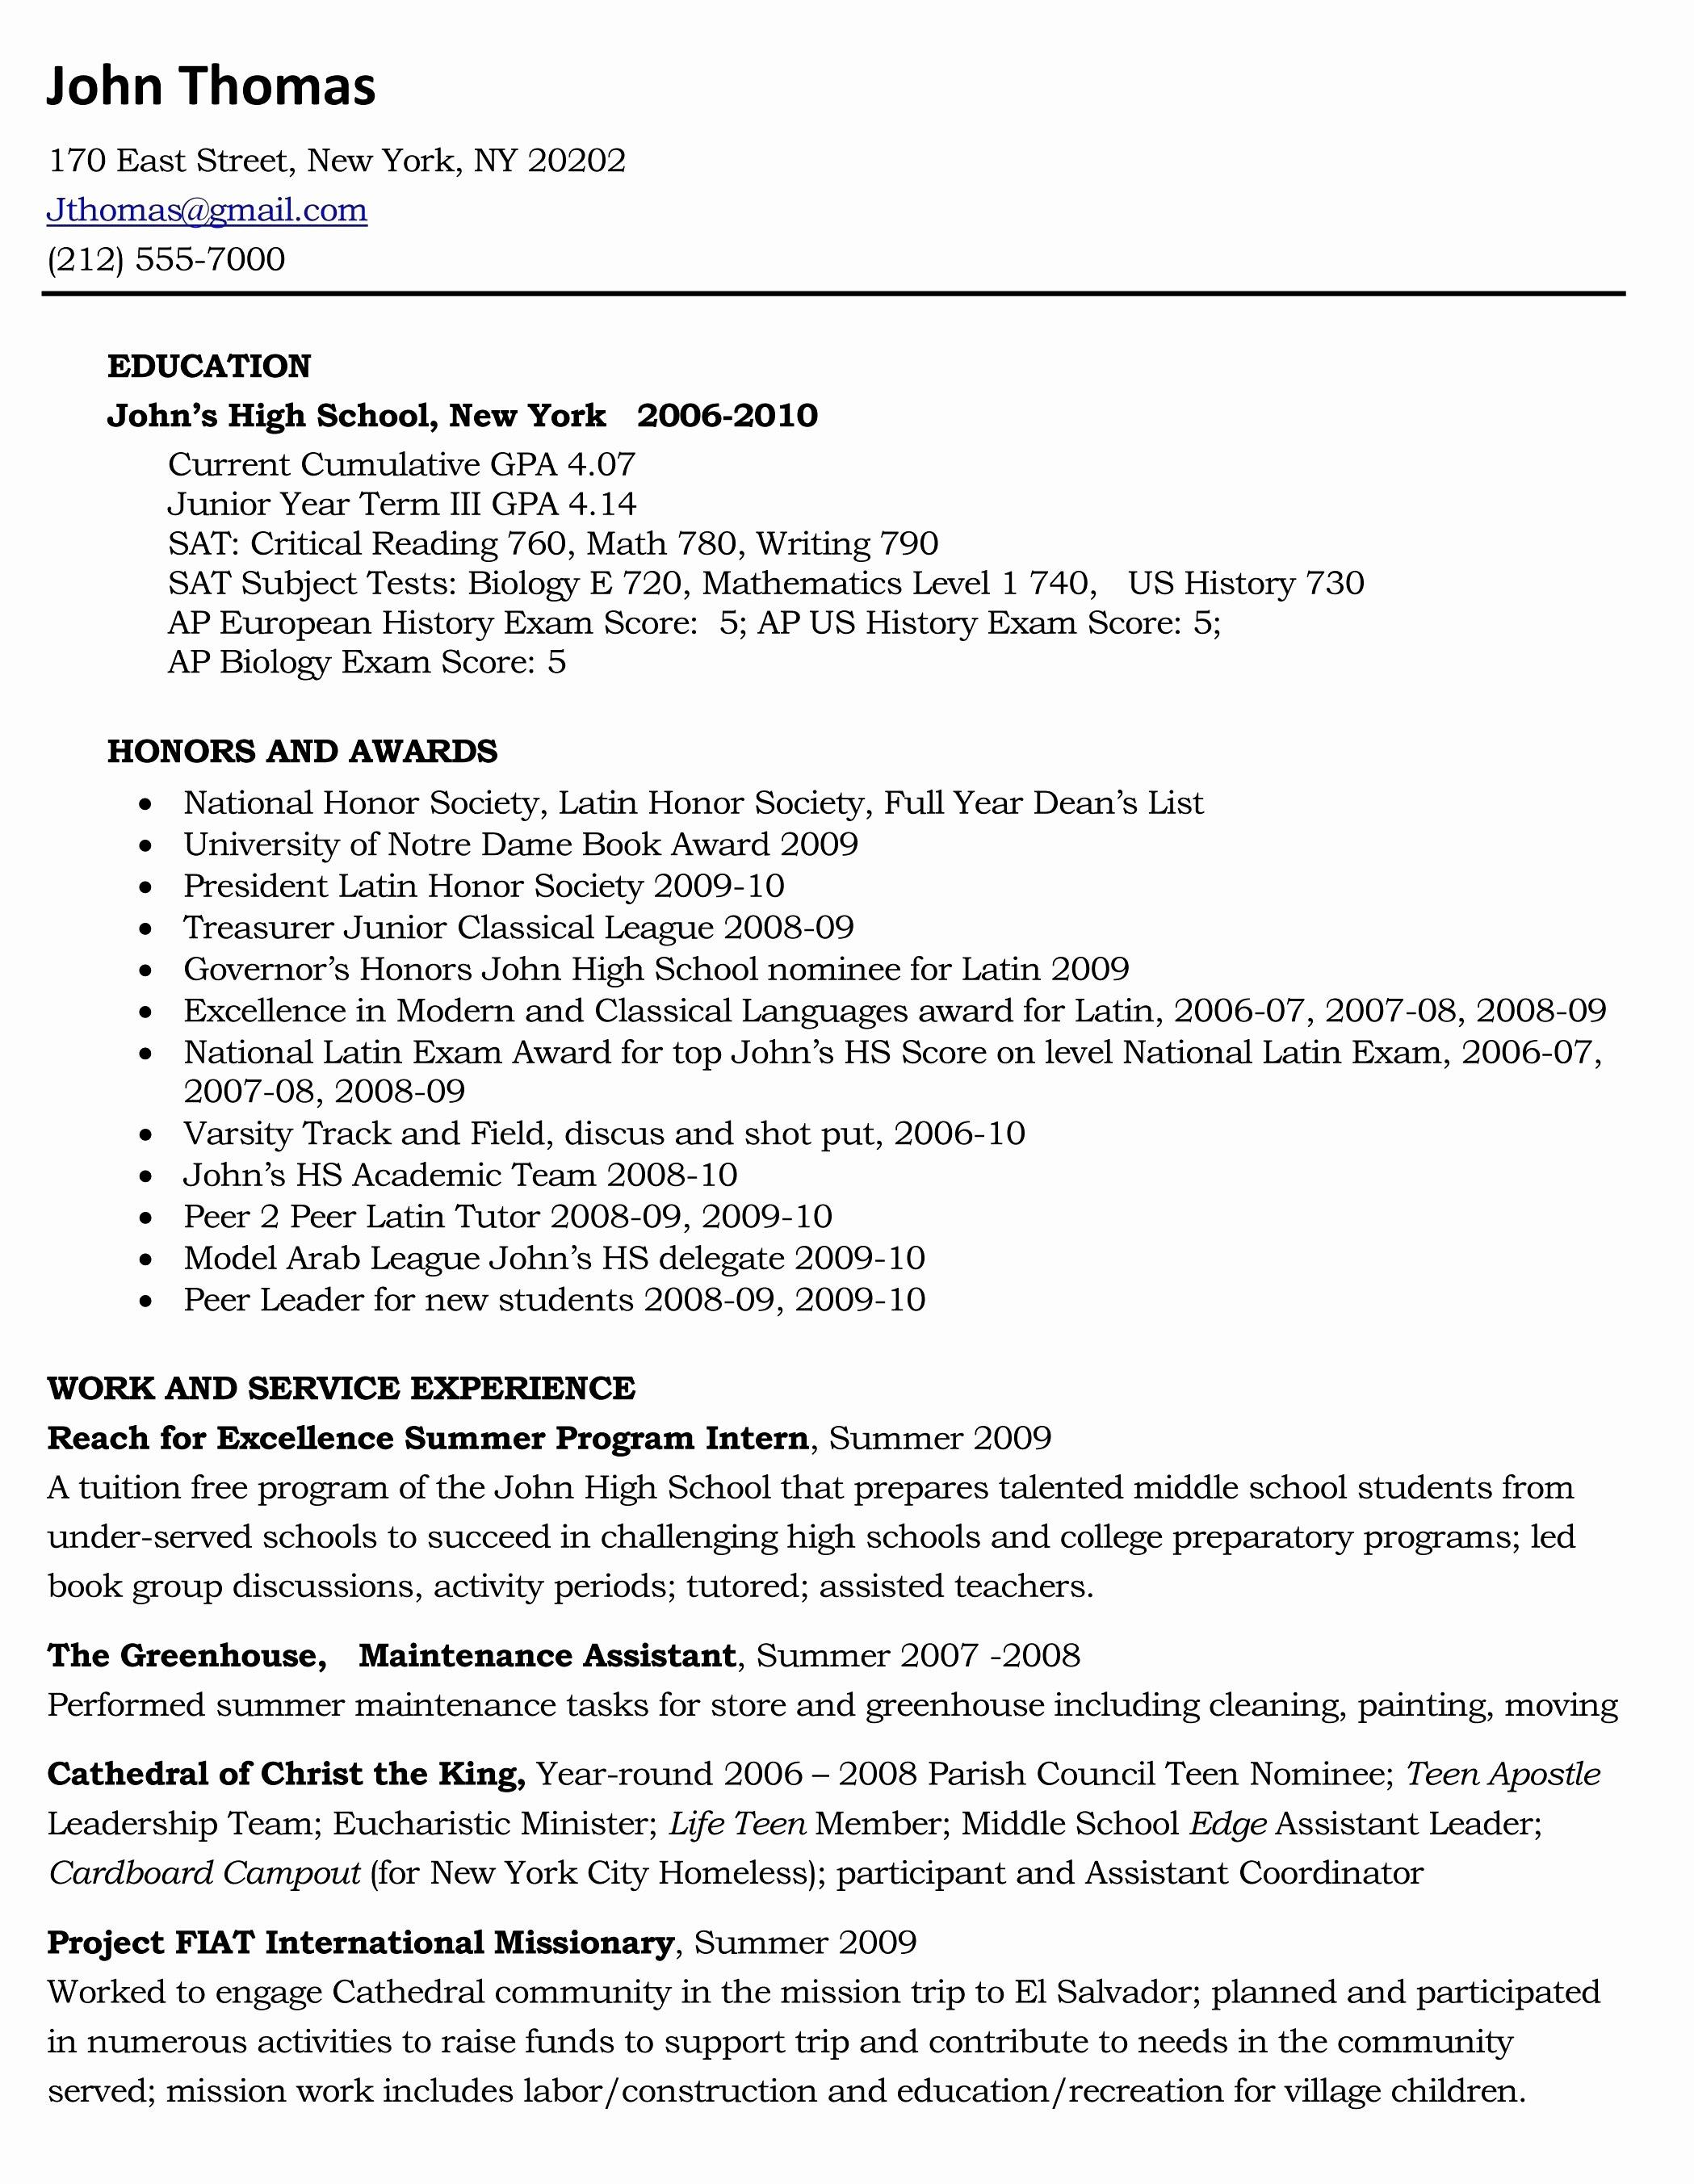 Mission Trip Letter Template - Resume Portfolio Template Inspirational Resume Portfolio Template